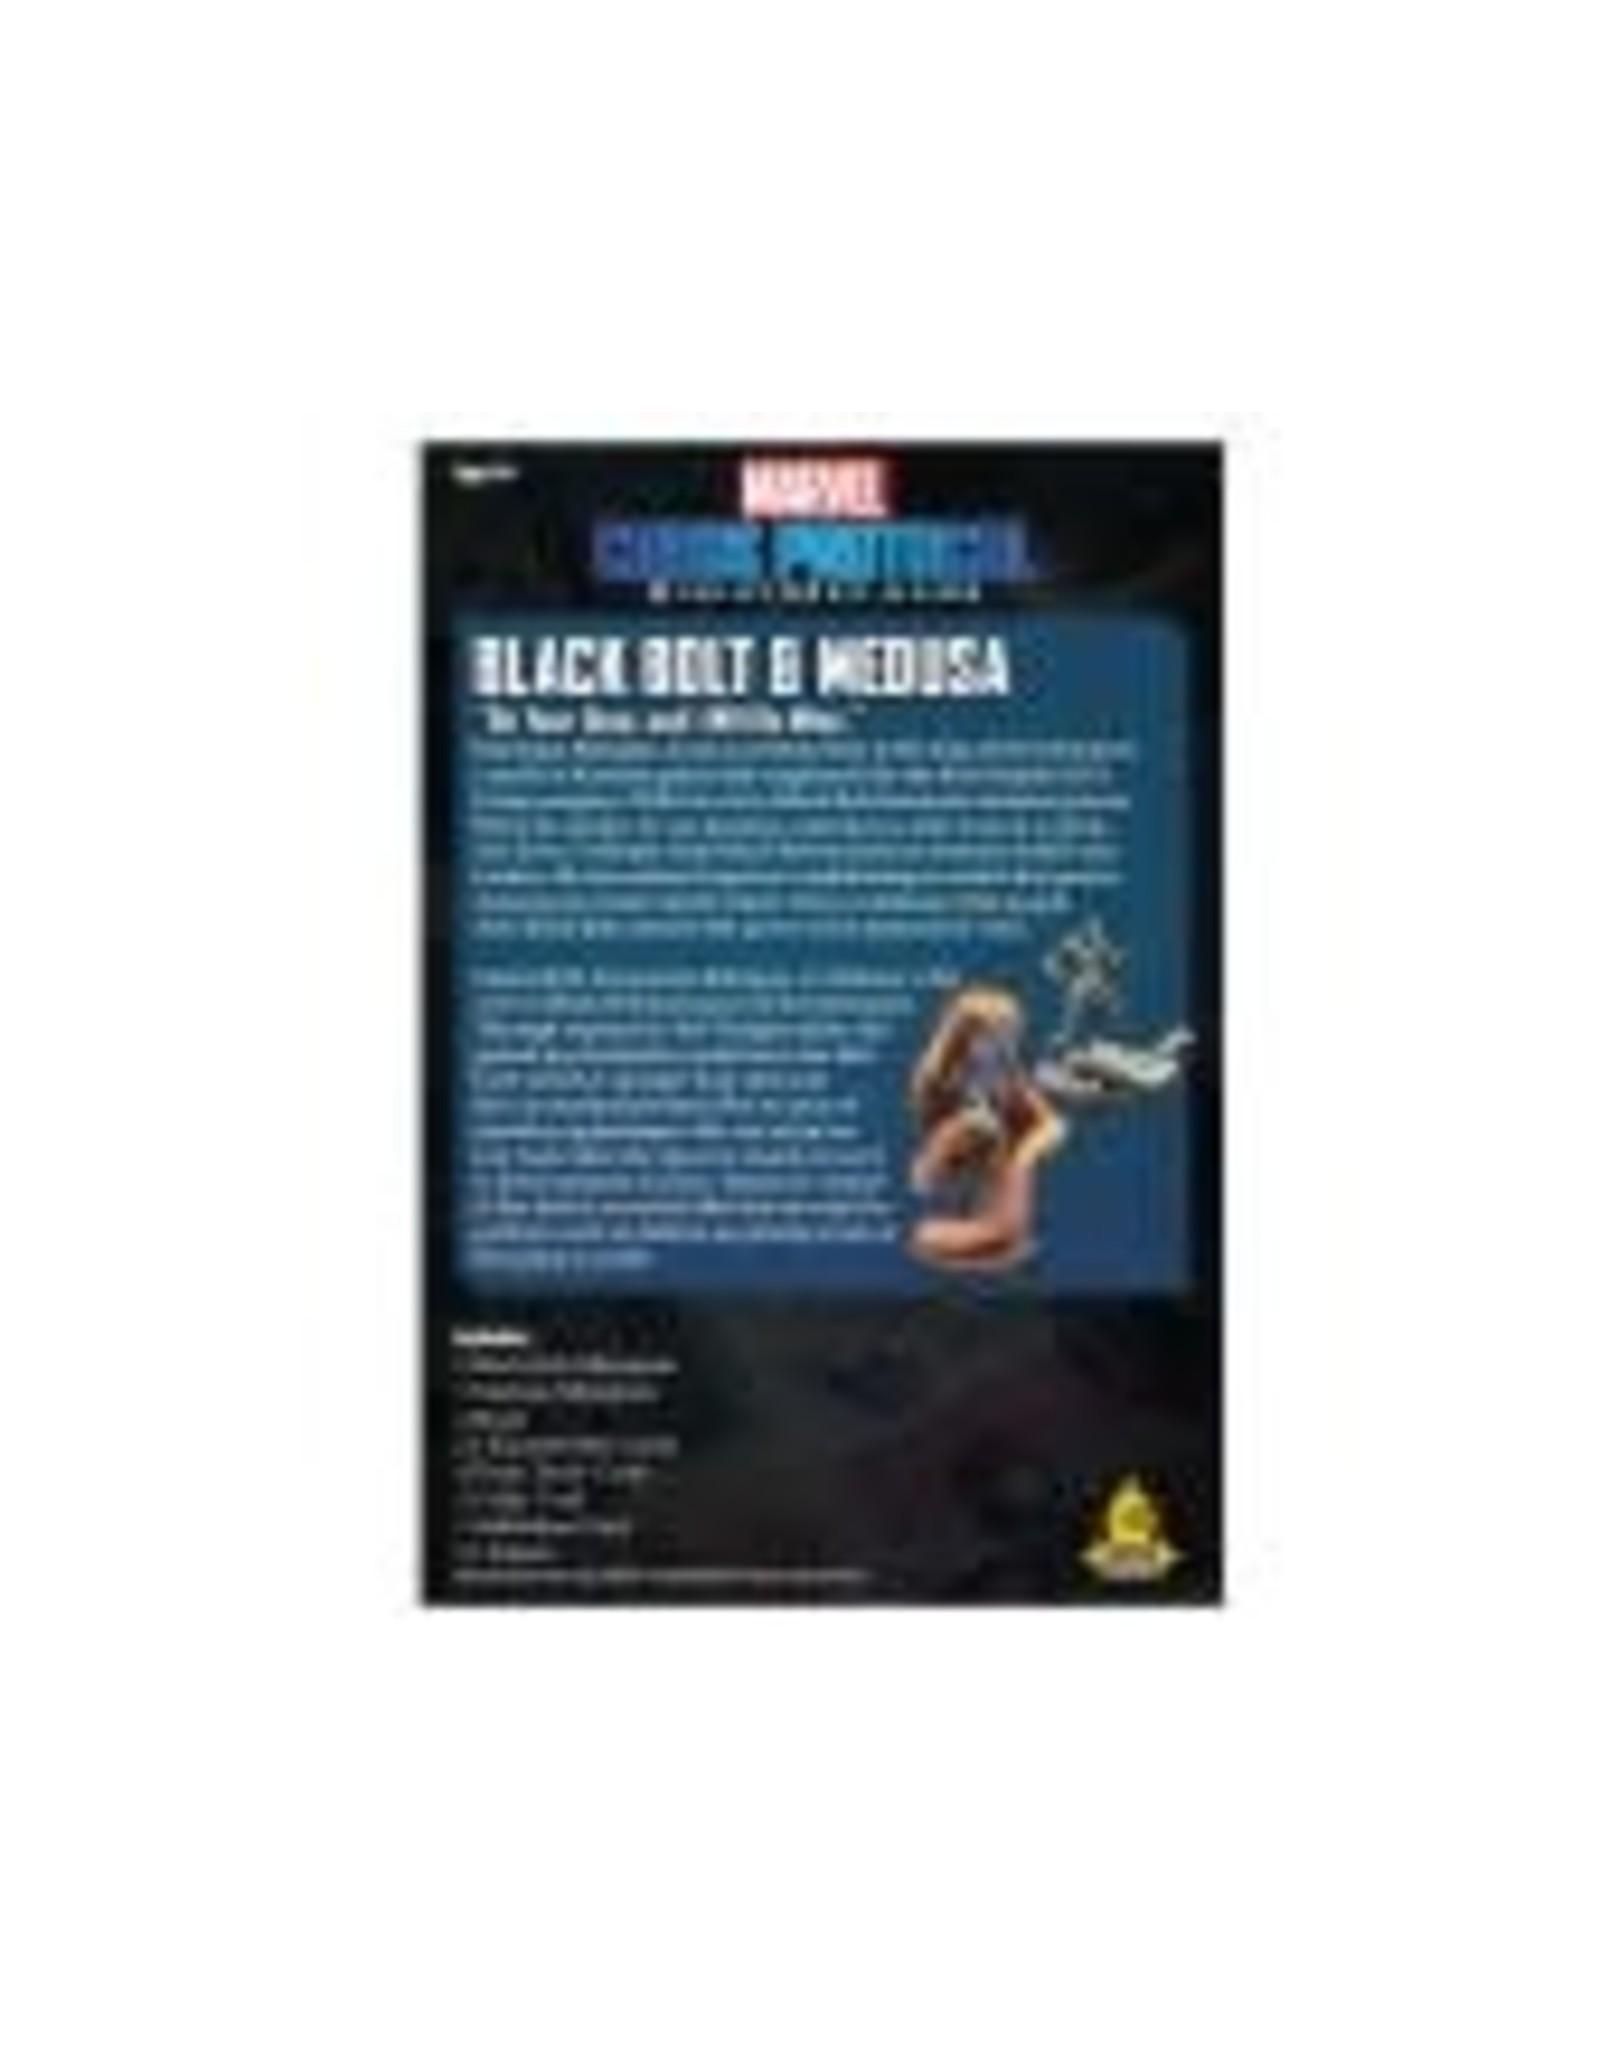 Atomic Mass Games Marvel Crisis Protocol: Black Bolt and Medusa Pack